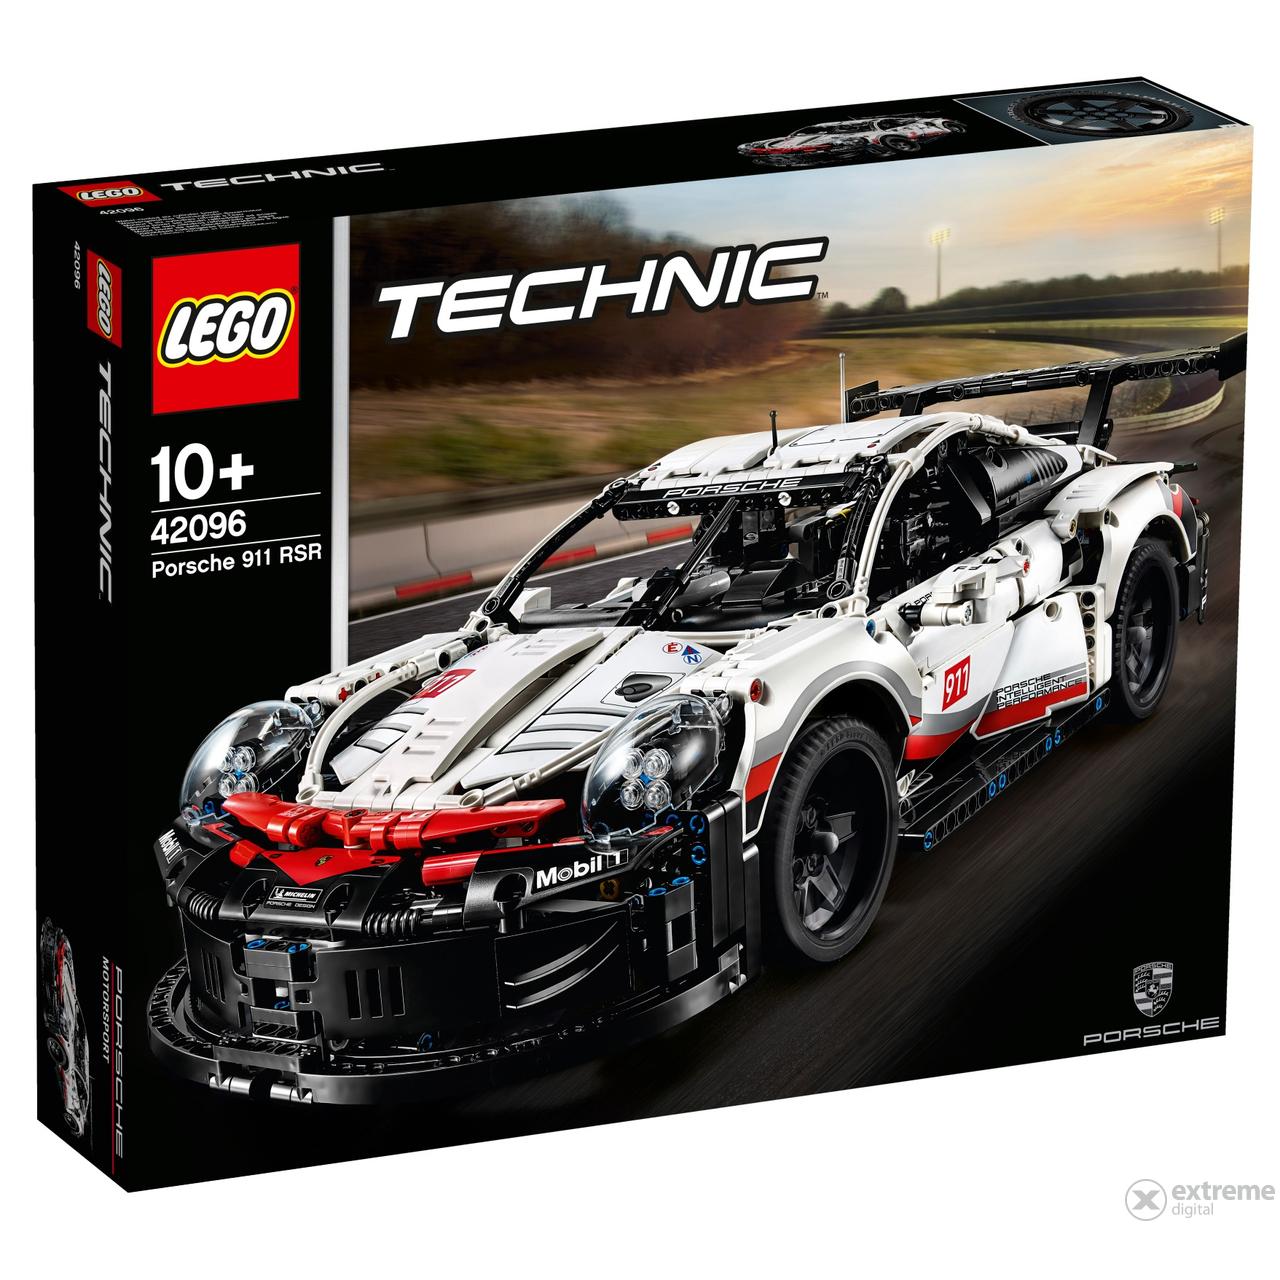 lego technic 42096 porsche 911 rsr extreme digital. Black Bedroom Furniture Sets. Home Design Ideas